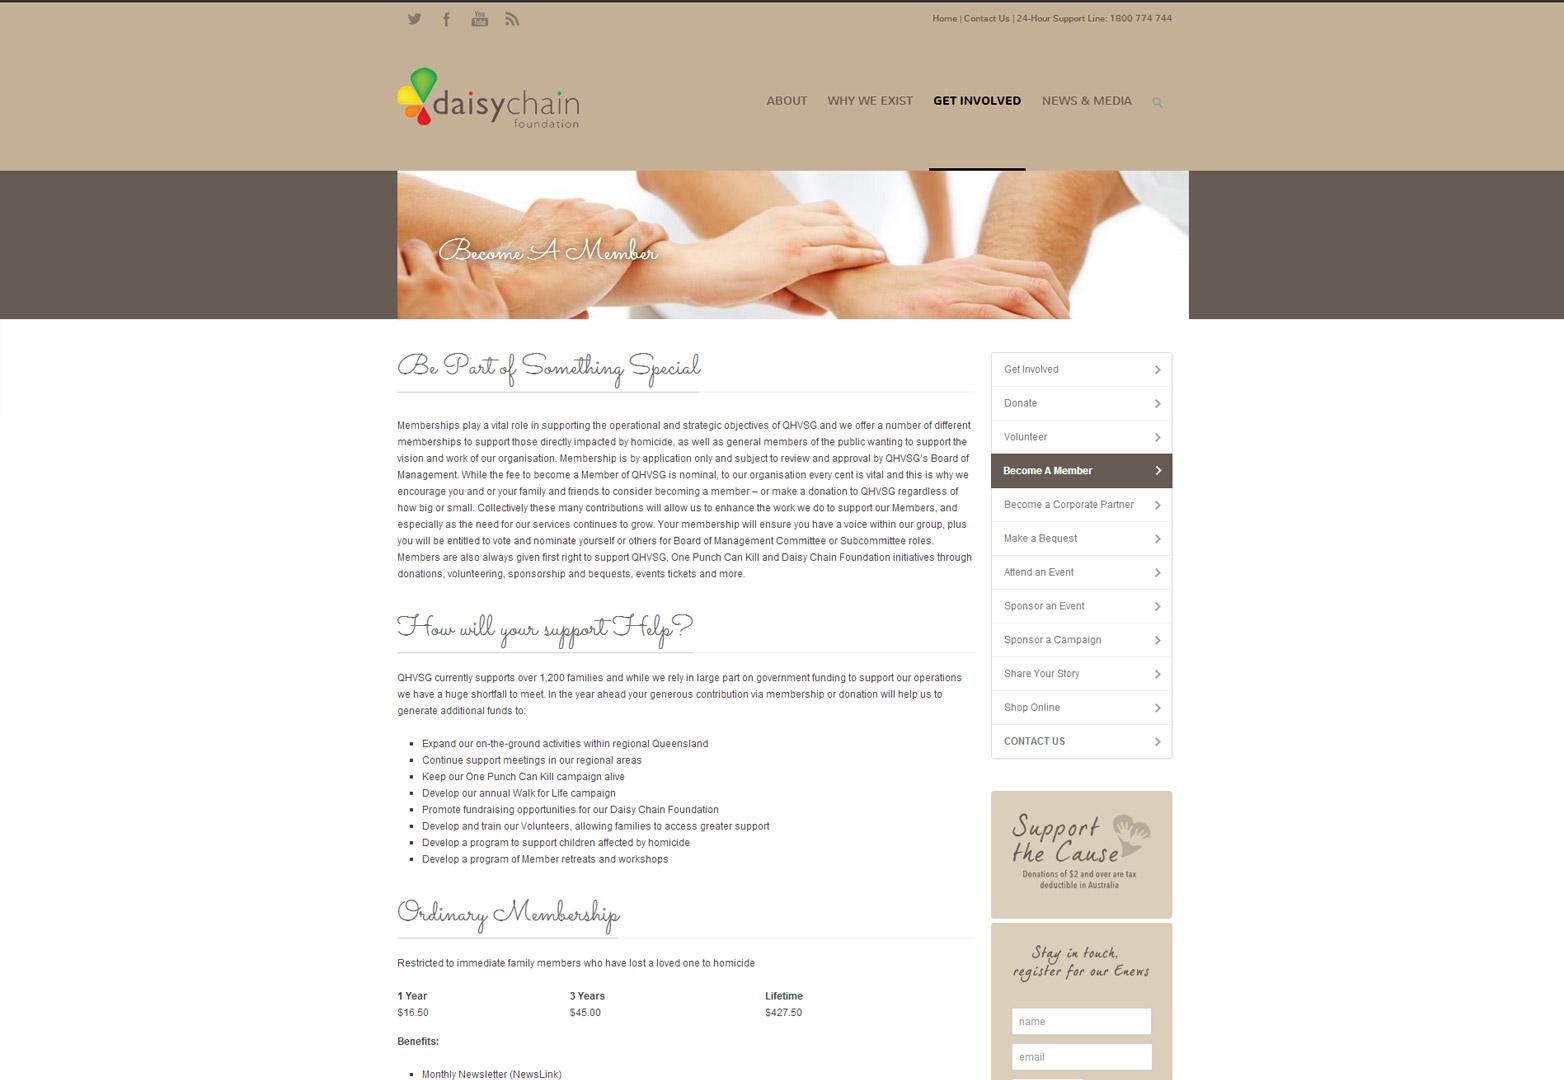 webdesign_daisychain02